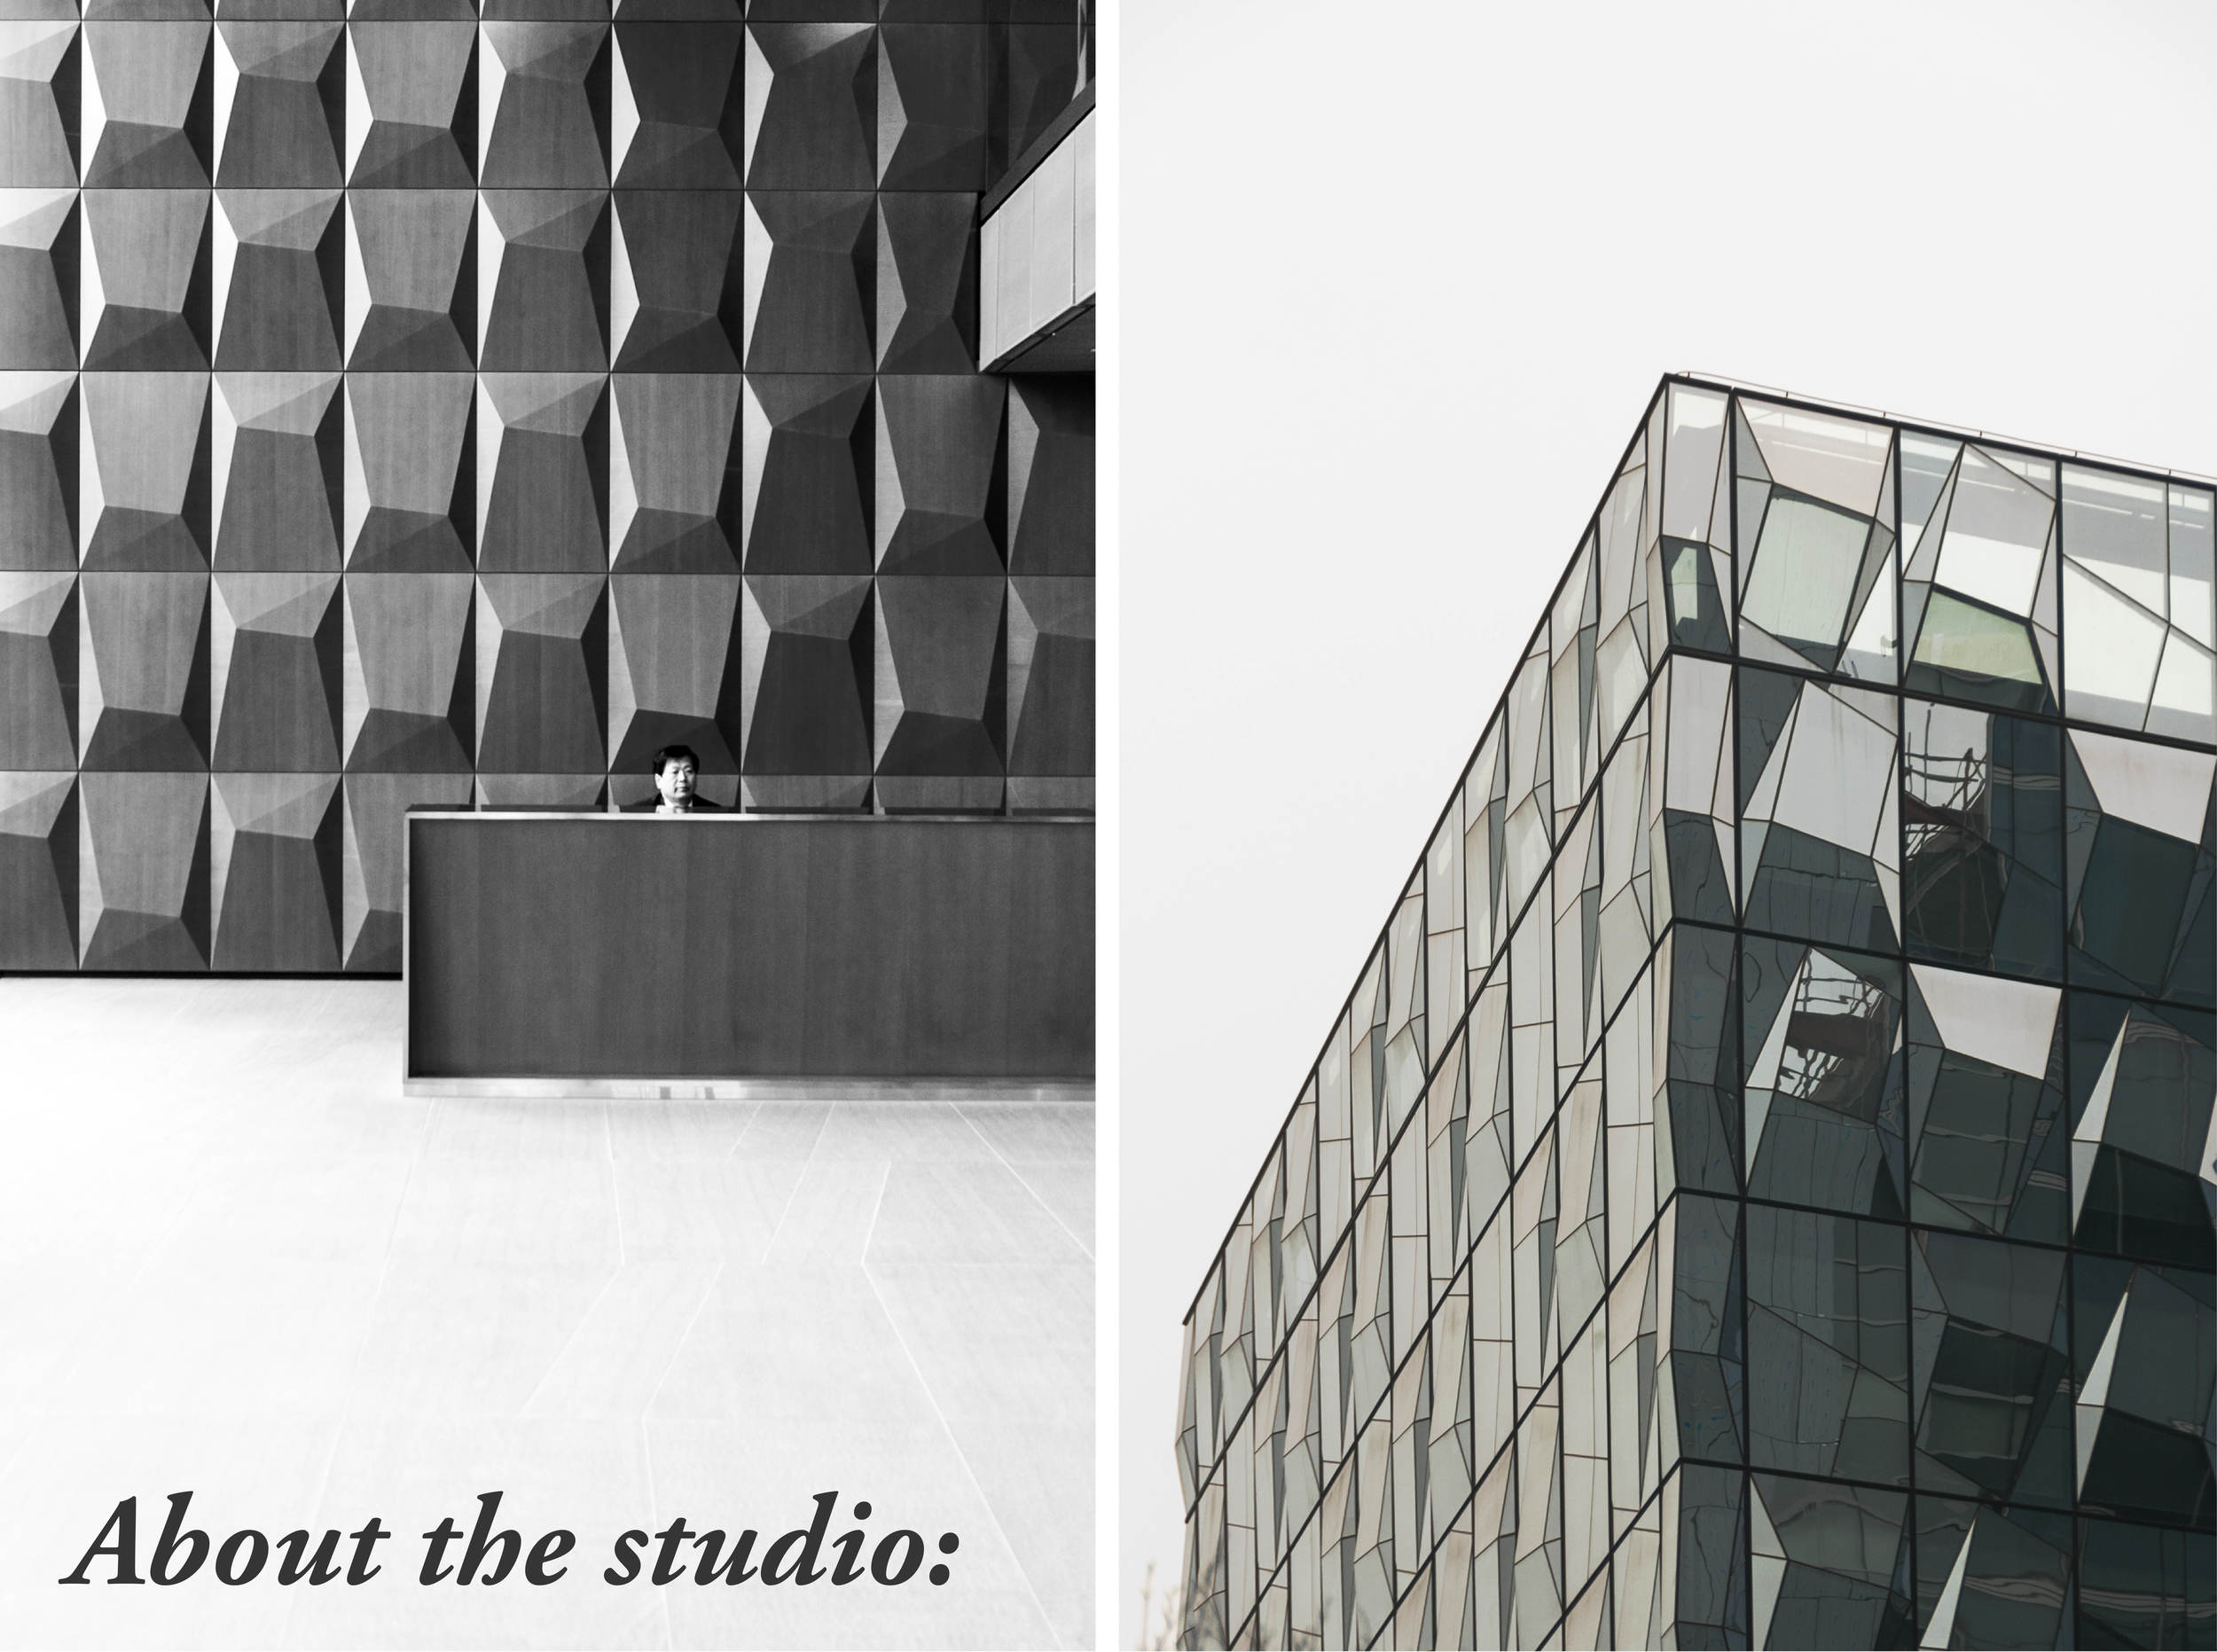 Trutec Building, Barkow Leibinger, DMC, Seoul, South Korea